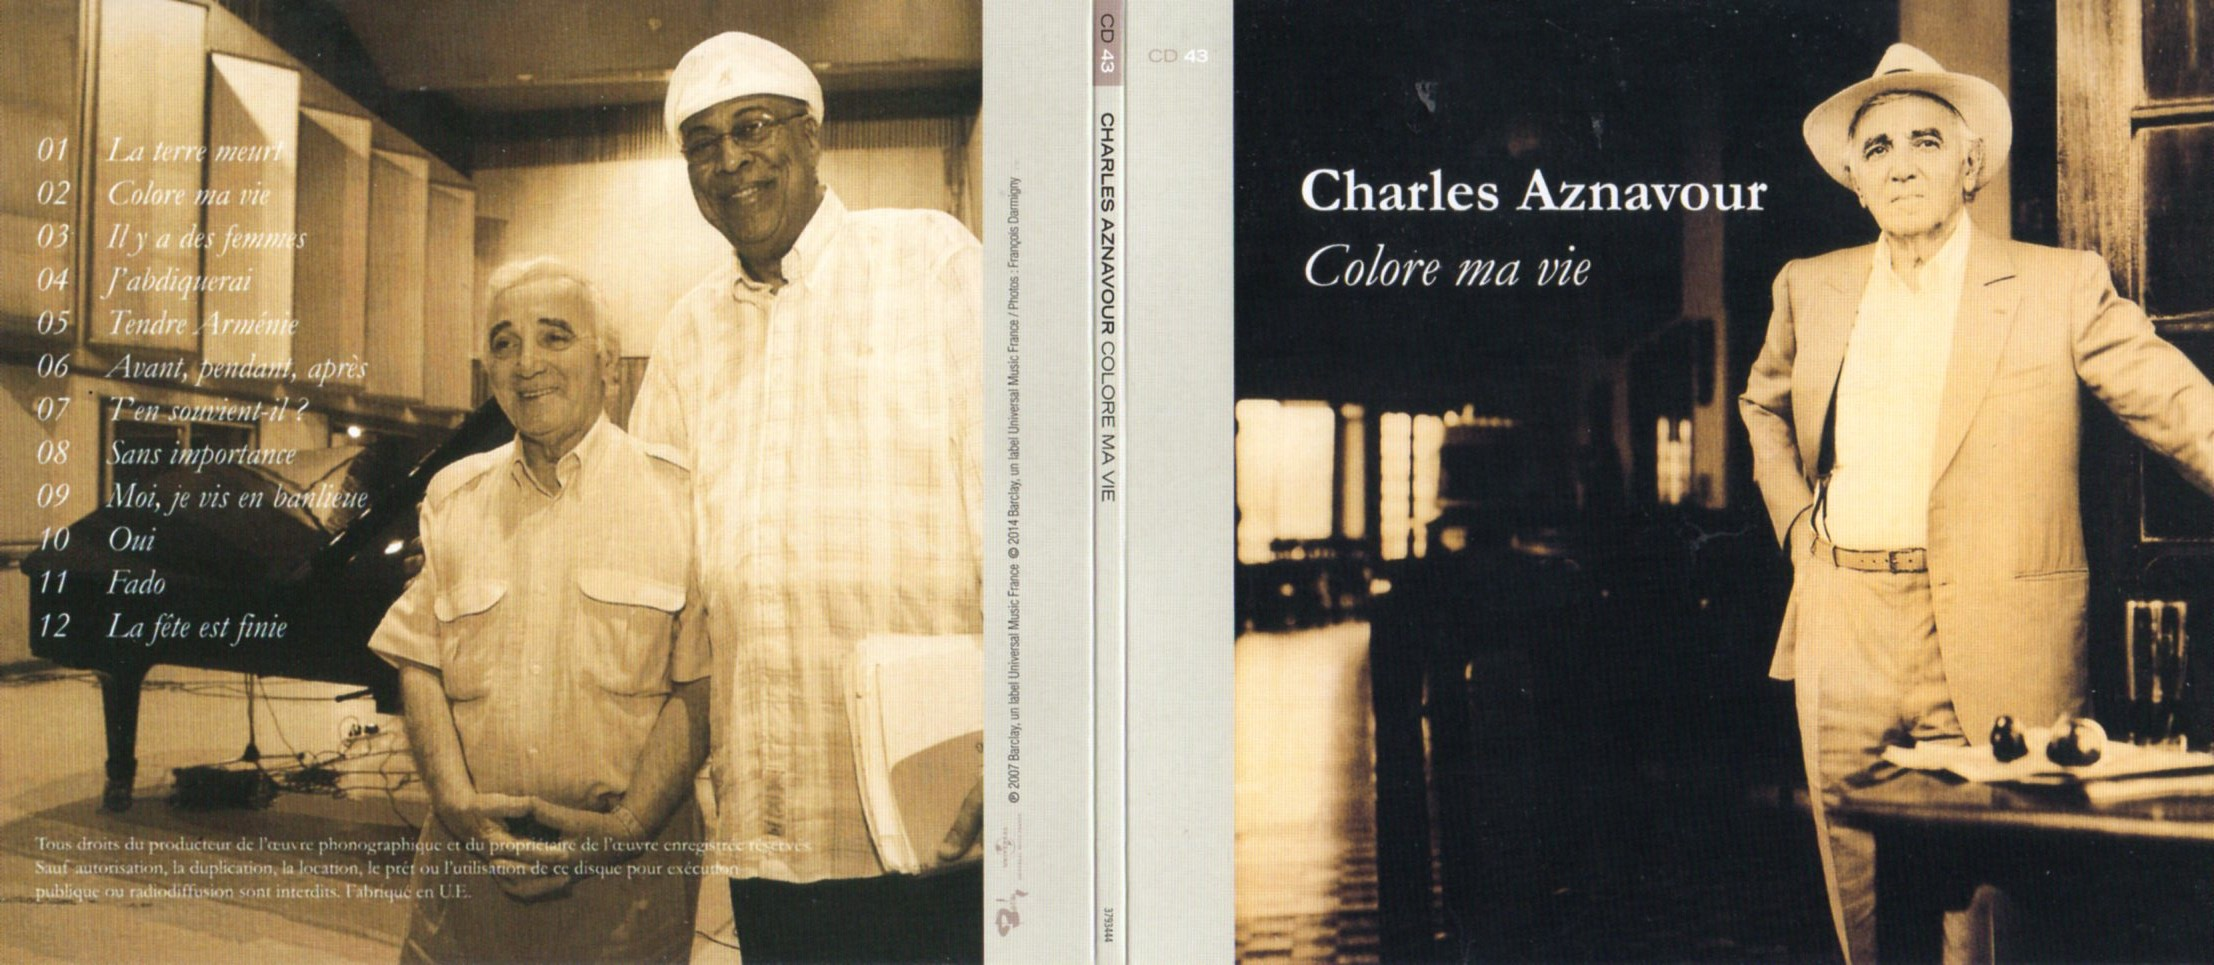 CHARLES AZNAVOUR - Colore Ma Vie (2007) Gatefold Card board sleeve - CD